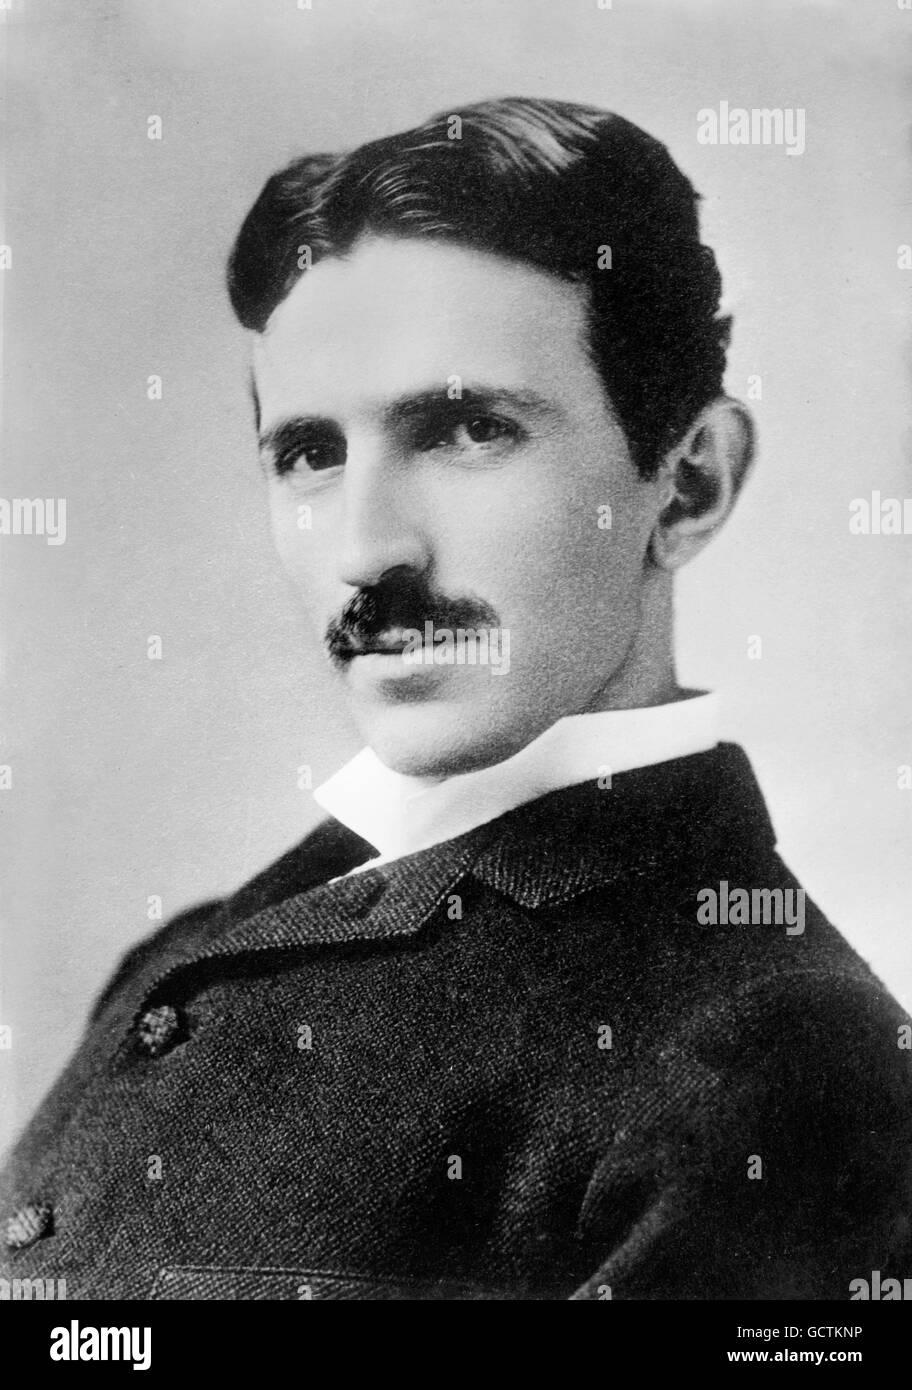 Nikola Tesla. Portrait of the inventor and engineer by Napoleon Sarony, c.1890. - Stock Image